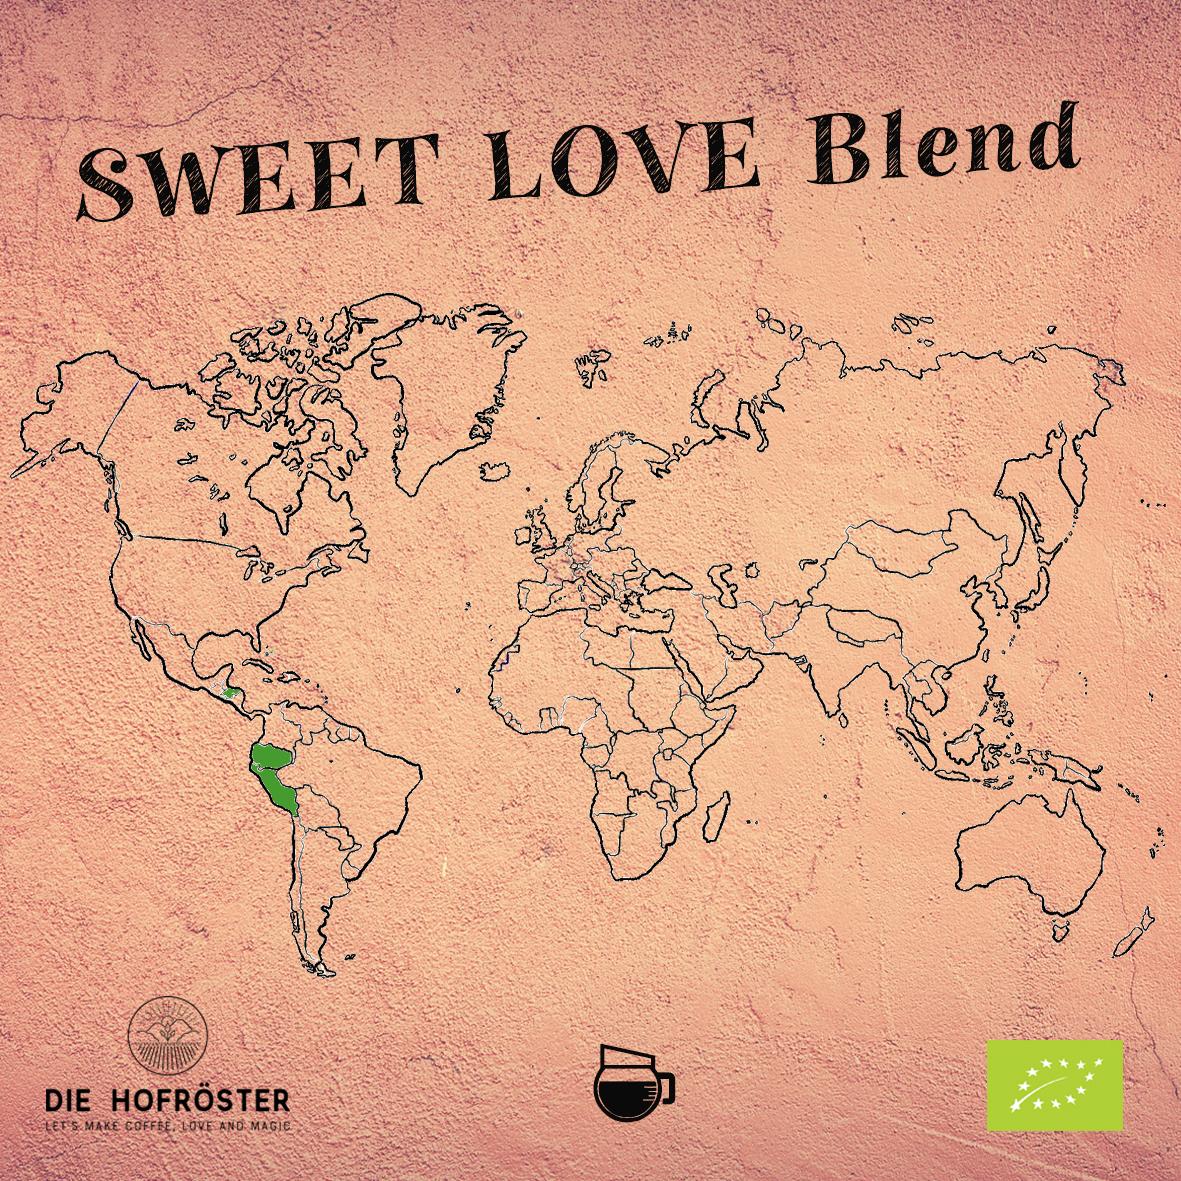 Sweet Love Blend